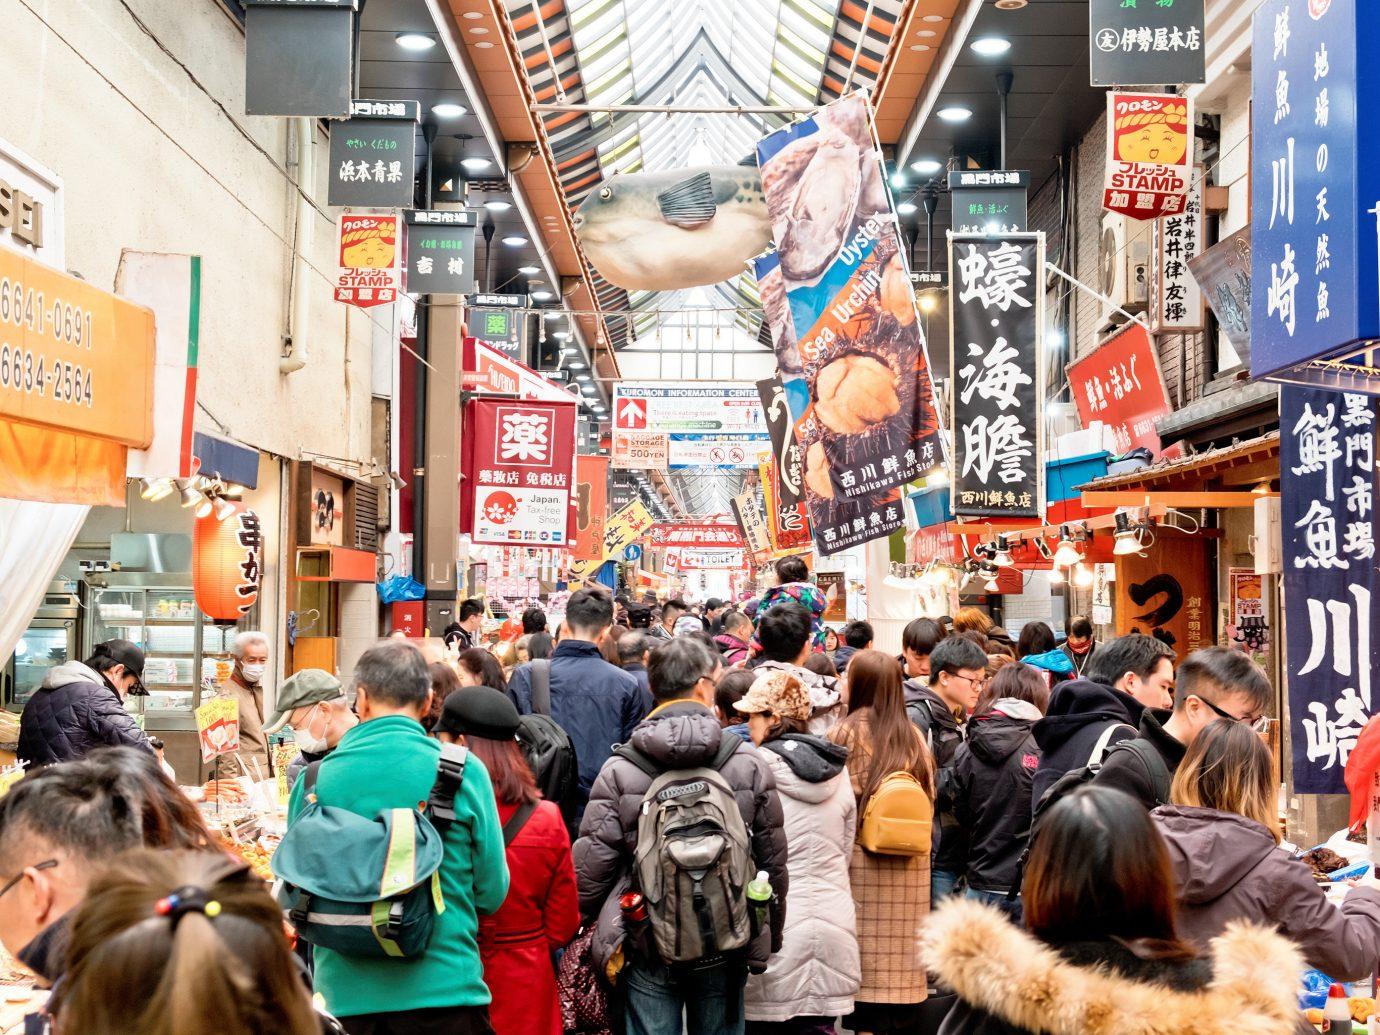 Japan Trip Ideas person street public space market urban area shopping crowd City marketplace scene bazaar retail service store